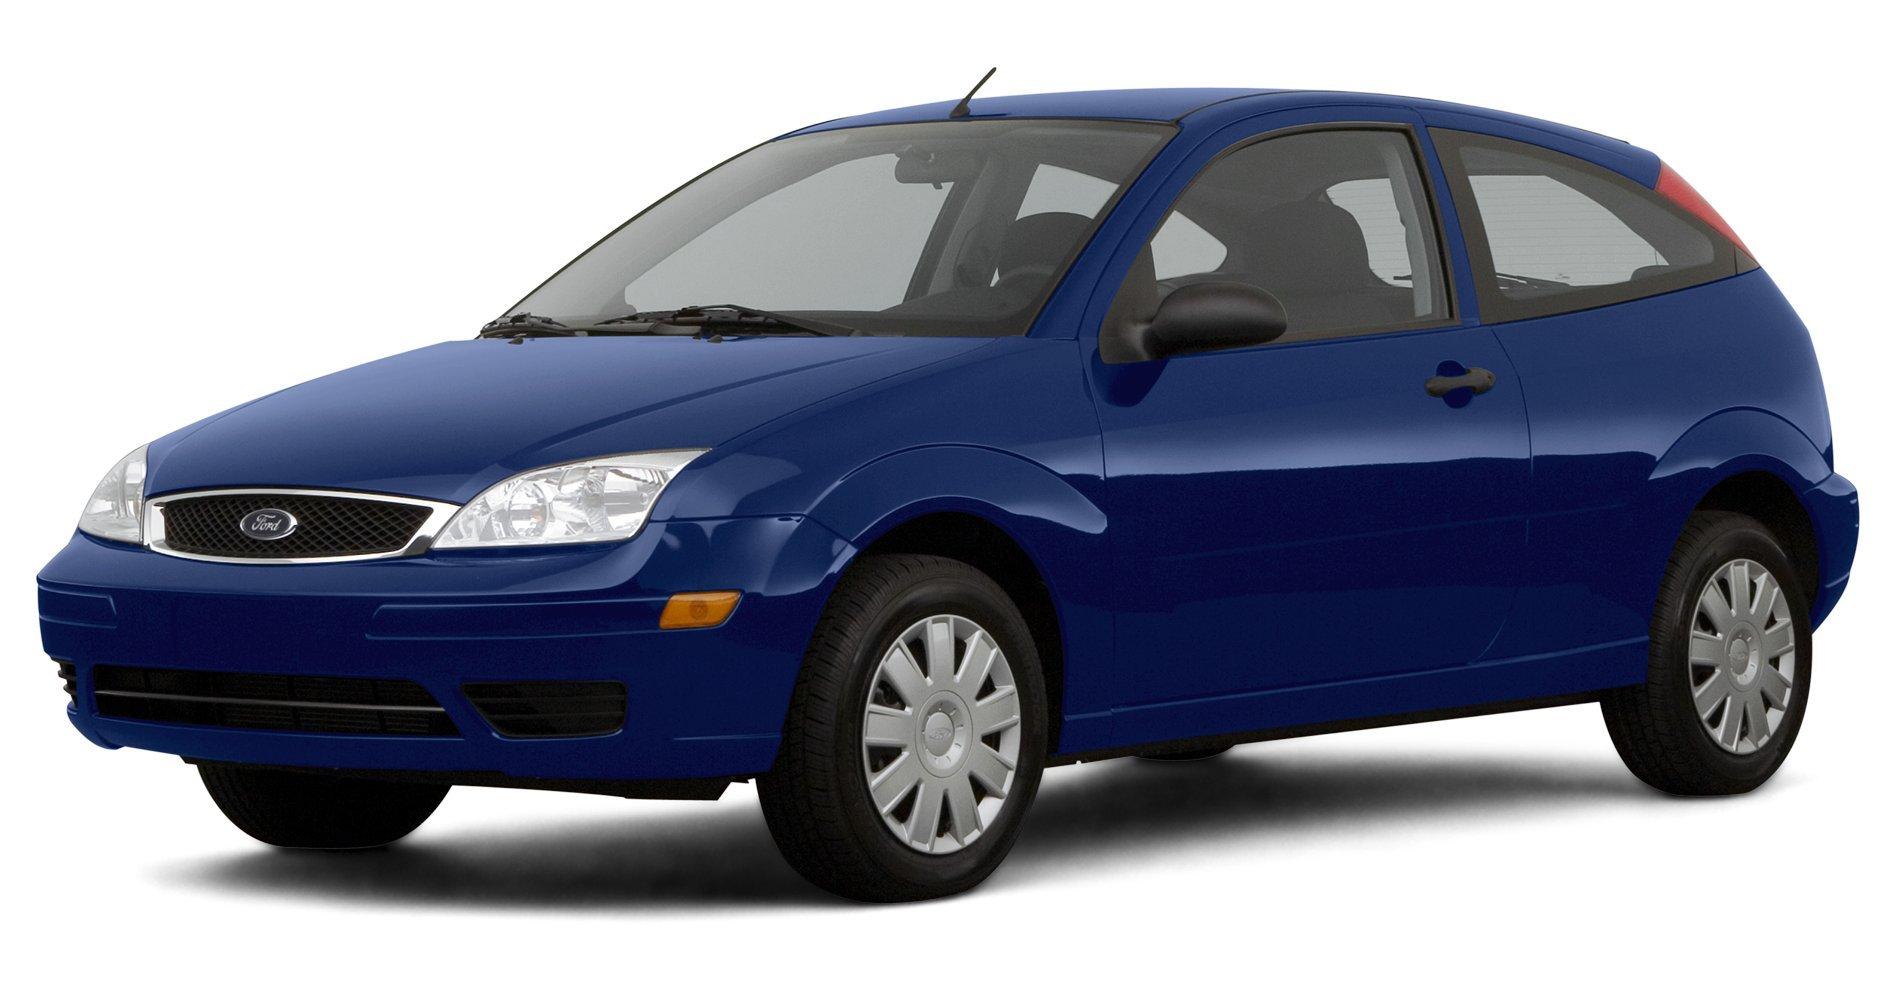 focus ford 2007 door amazon hatchback cobalt chevrolet coupe vehicles se specs cars parts transmission aqua manual metallic ls